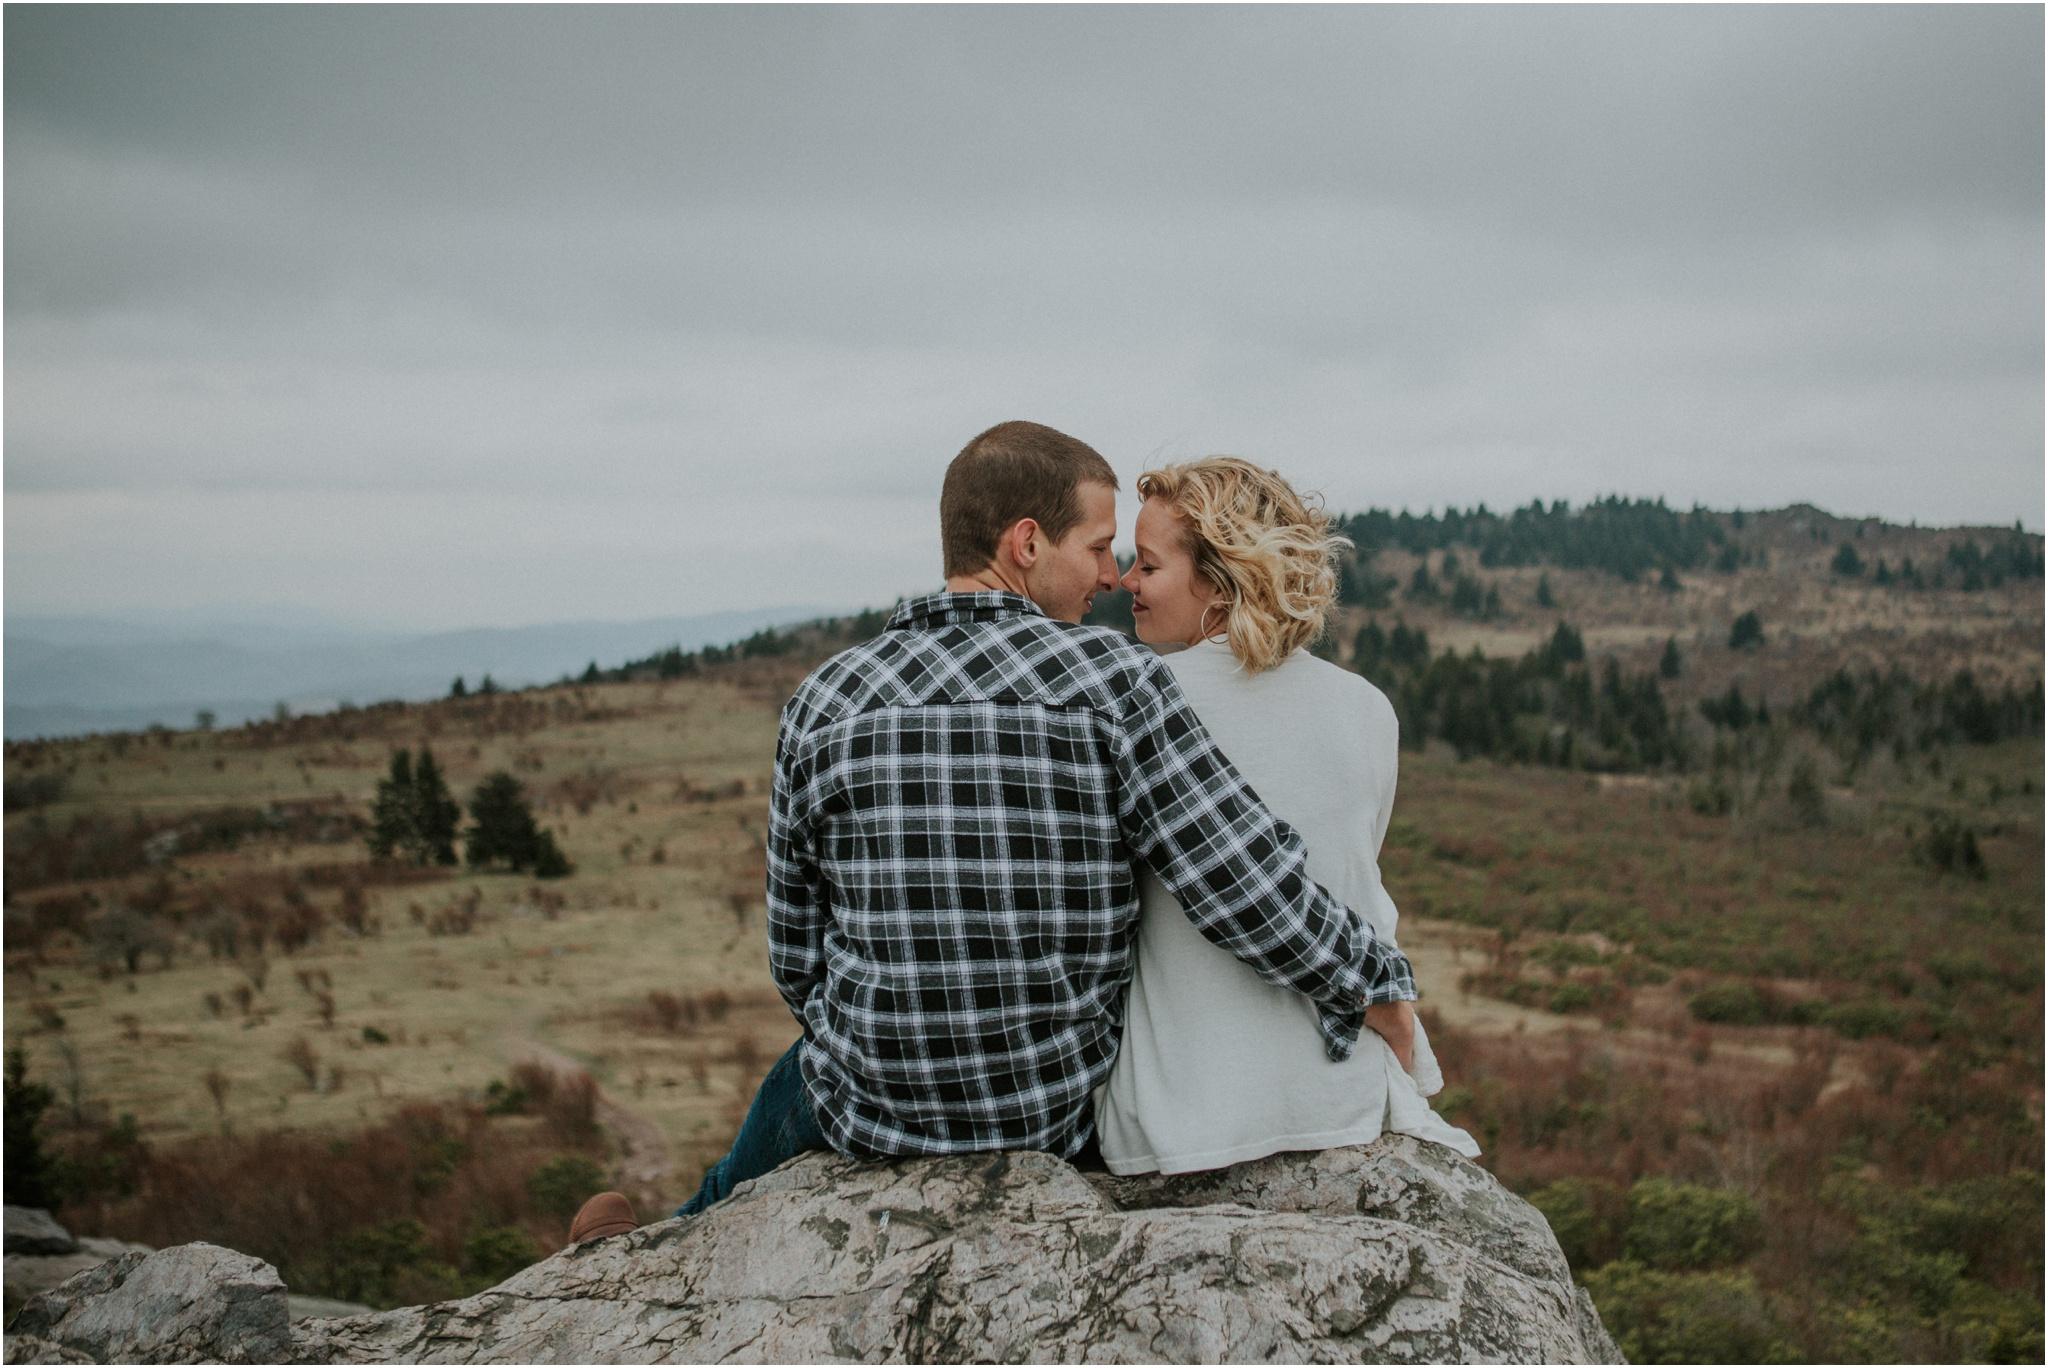 grayson-highlands-engagement-session-foggy-mountain-rustic-appalachian-virginia-katy-sergent-photography_0027.jpg